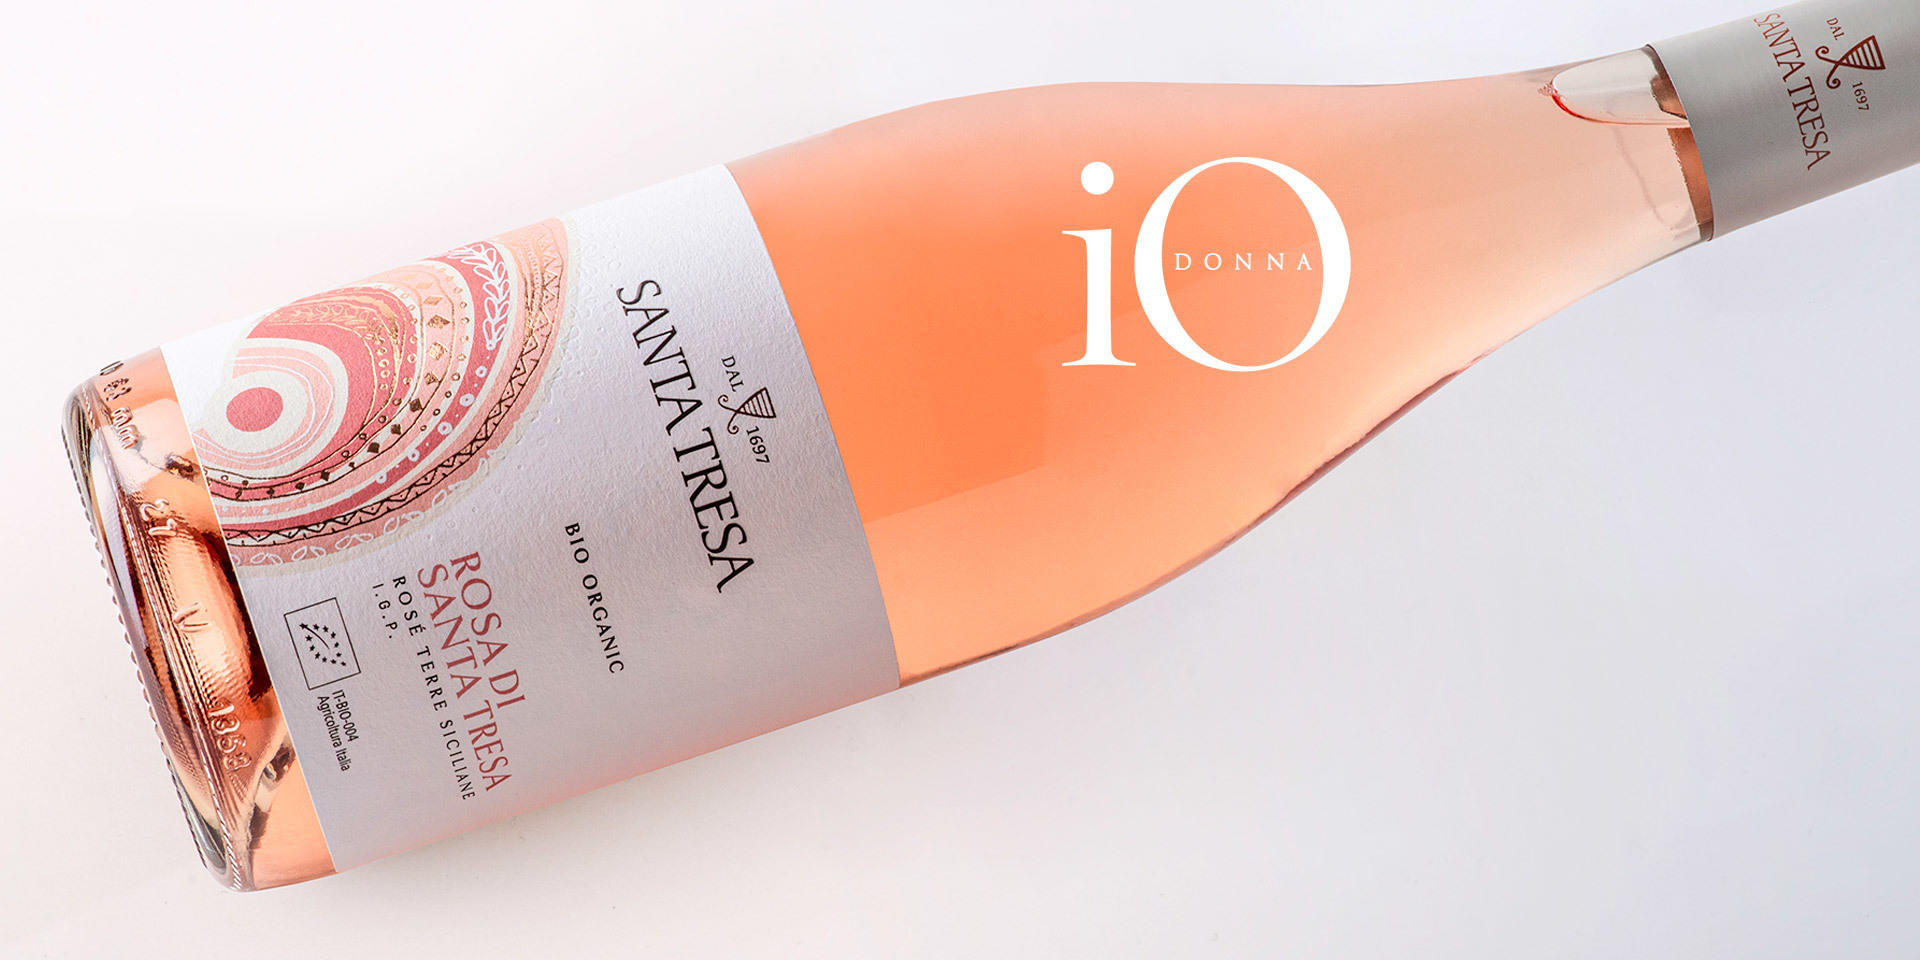 Rosa di Santa Tresa tra i 20 Vini rosé per sentirsi in Costa Azzurra anche da casa